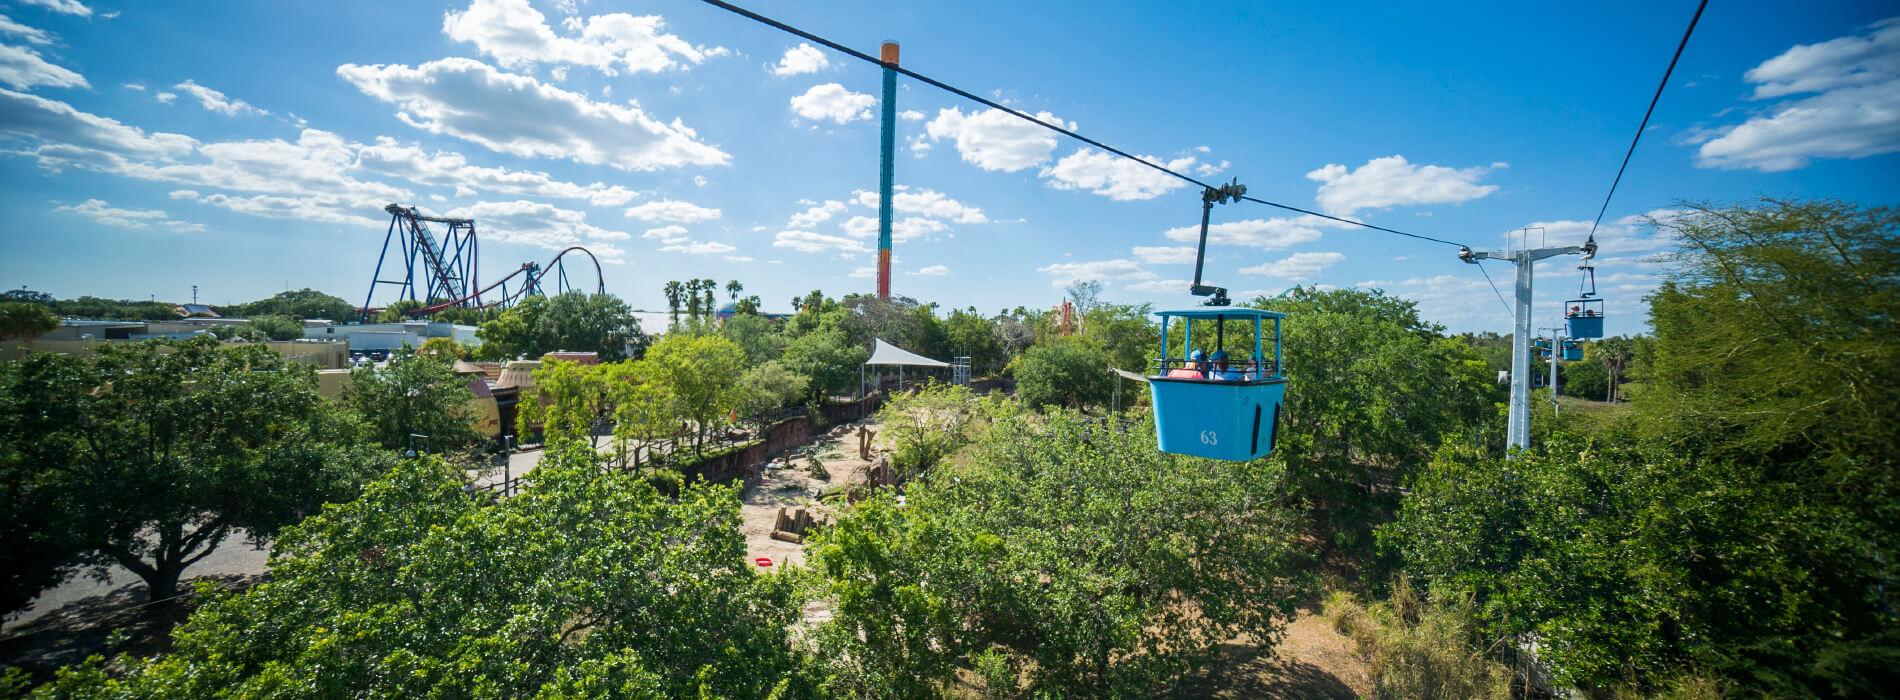 Skyride at Busch Gardens  Tampa Bay